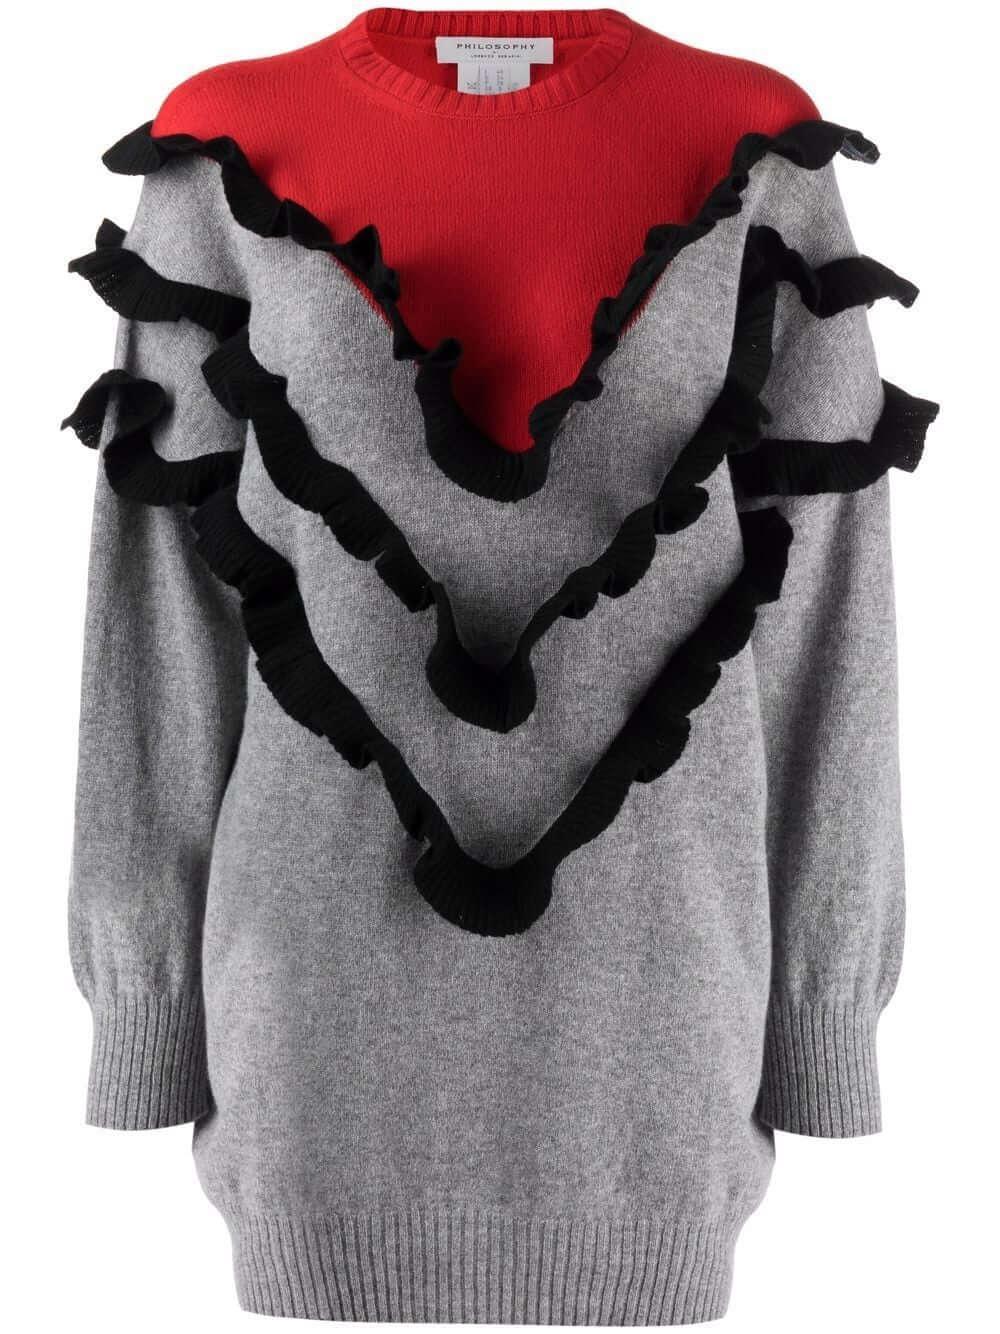 Ruffle Detail Sweater Item # 0485-5702